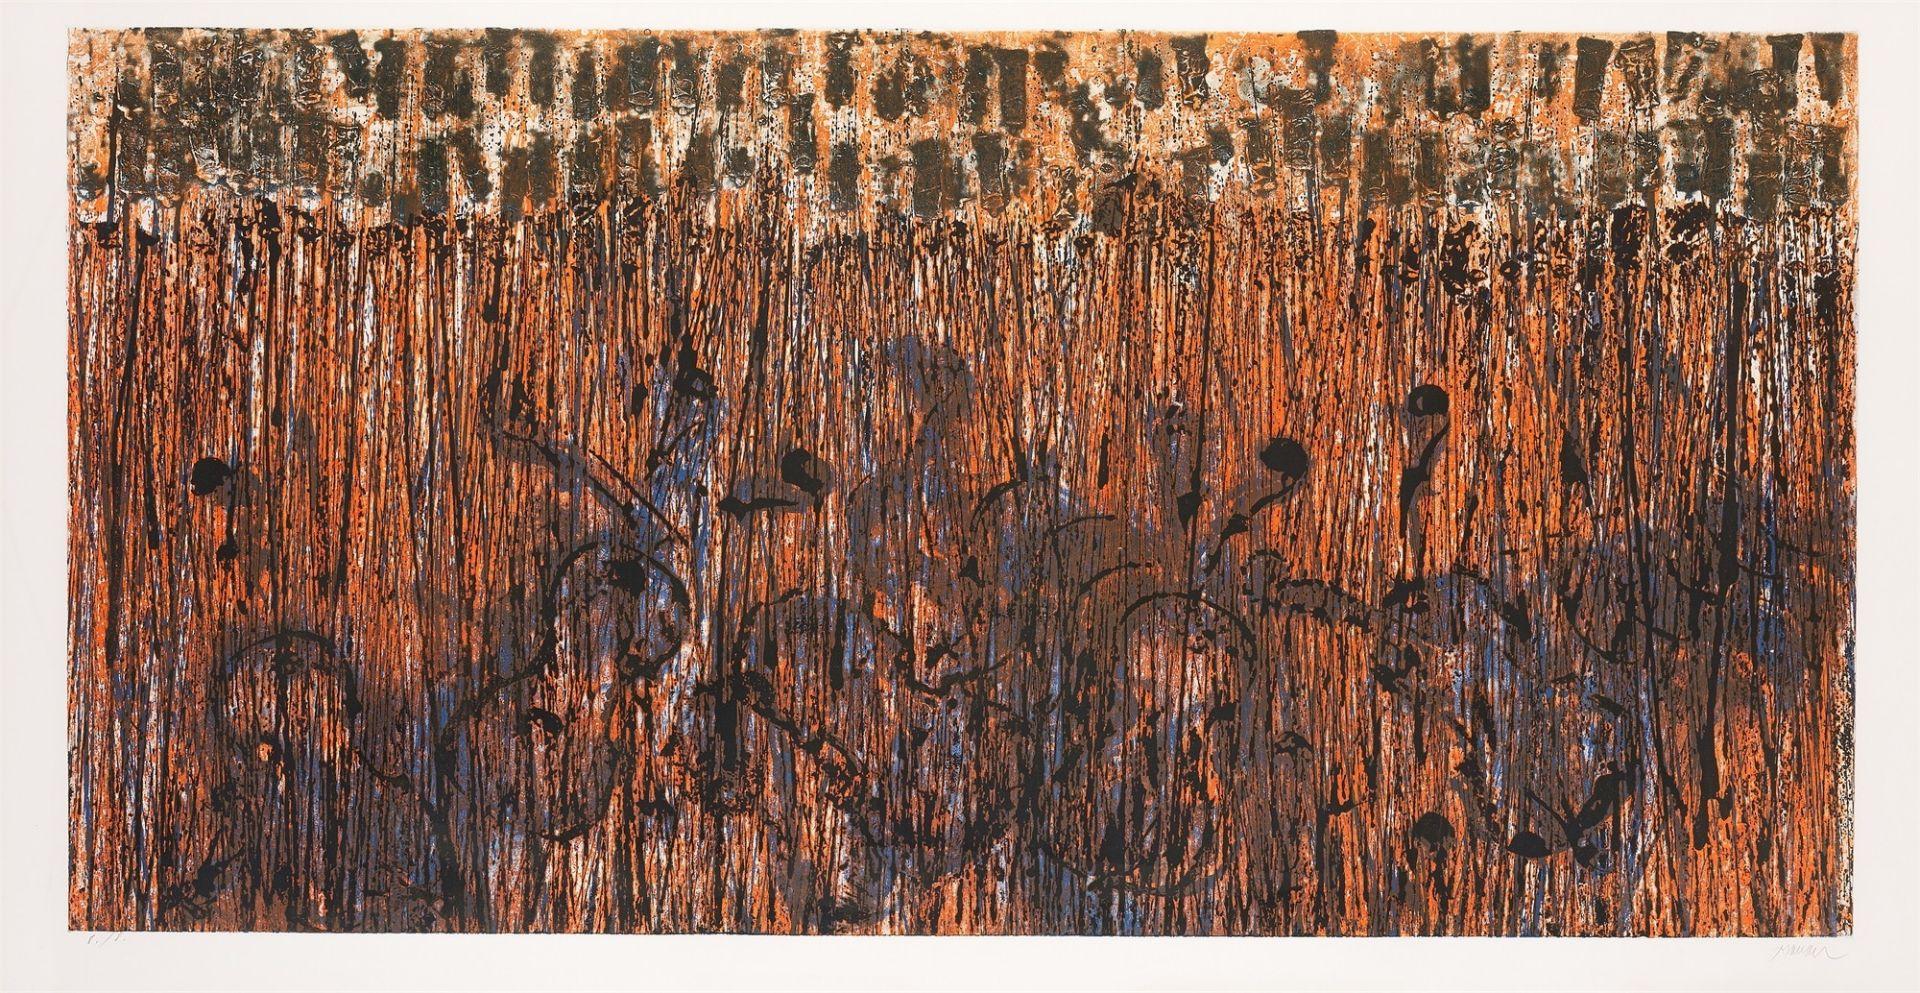 Arman. Untitled. 1990